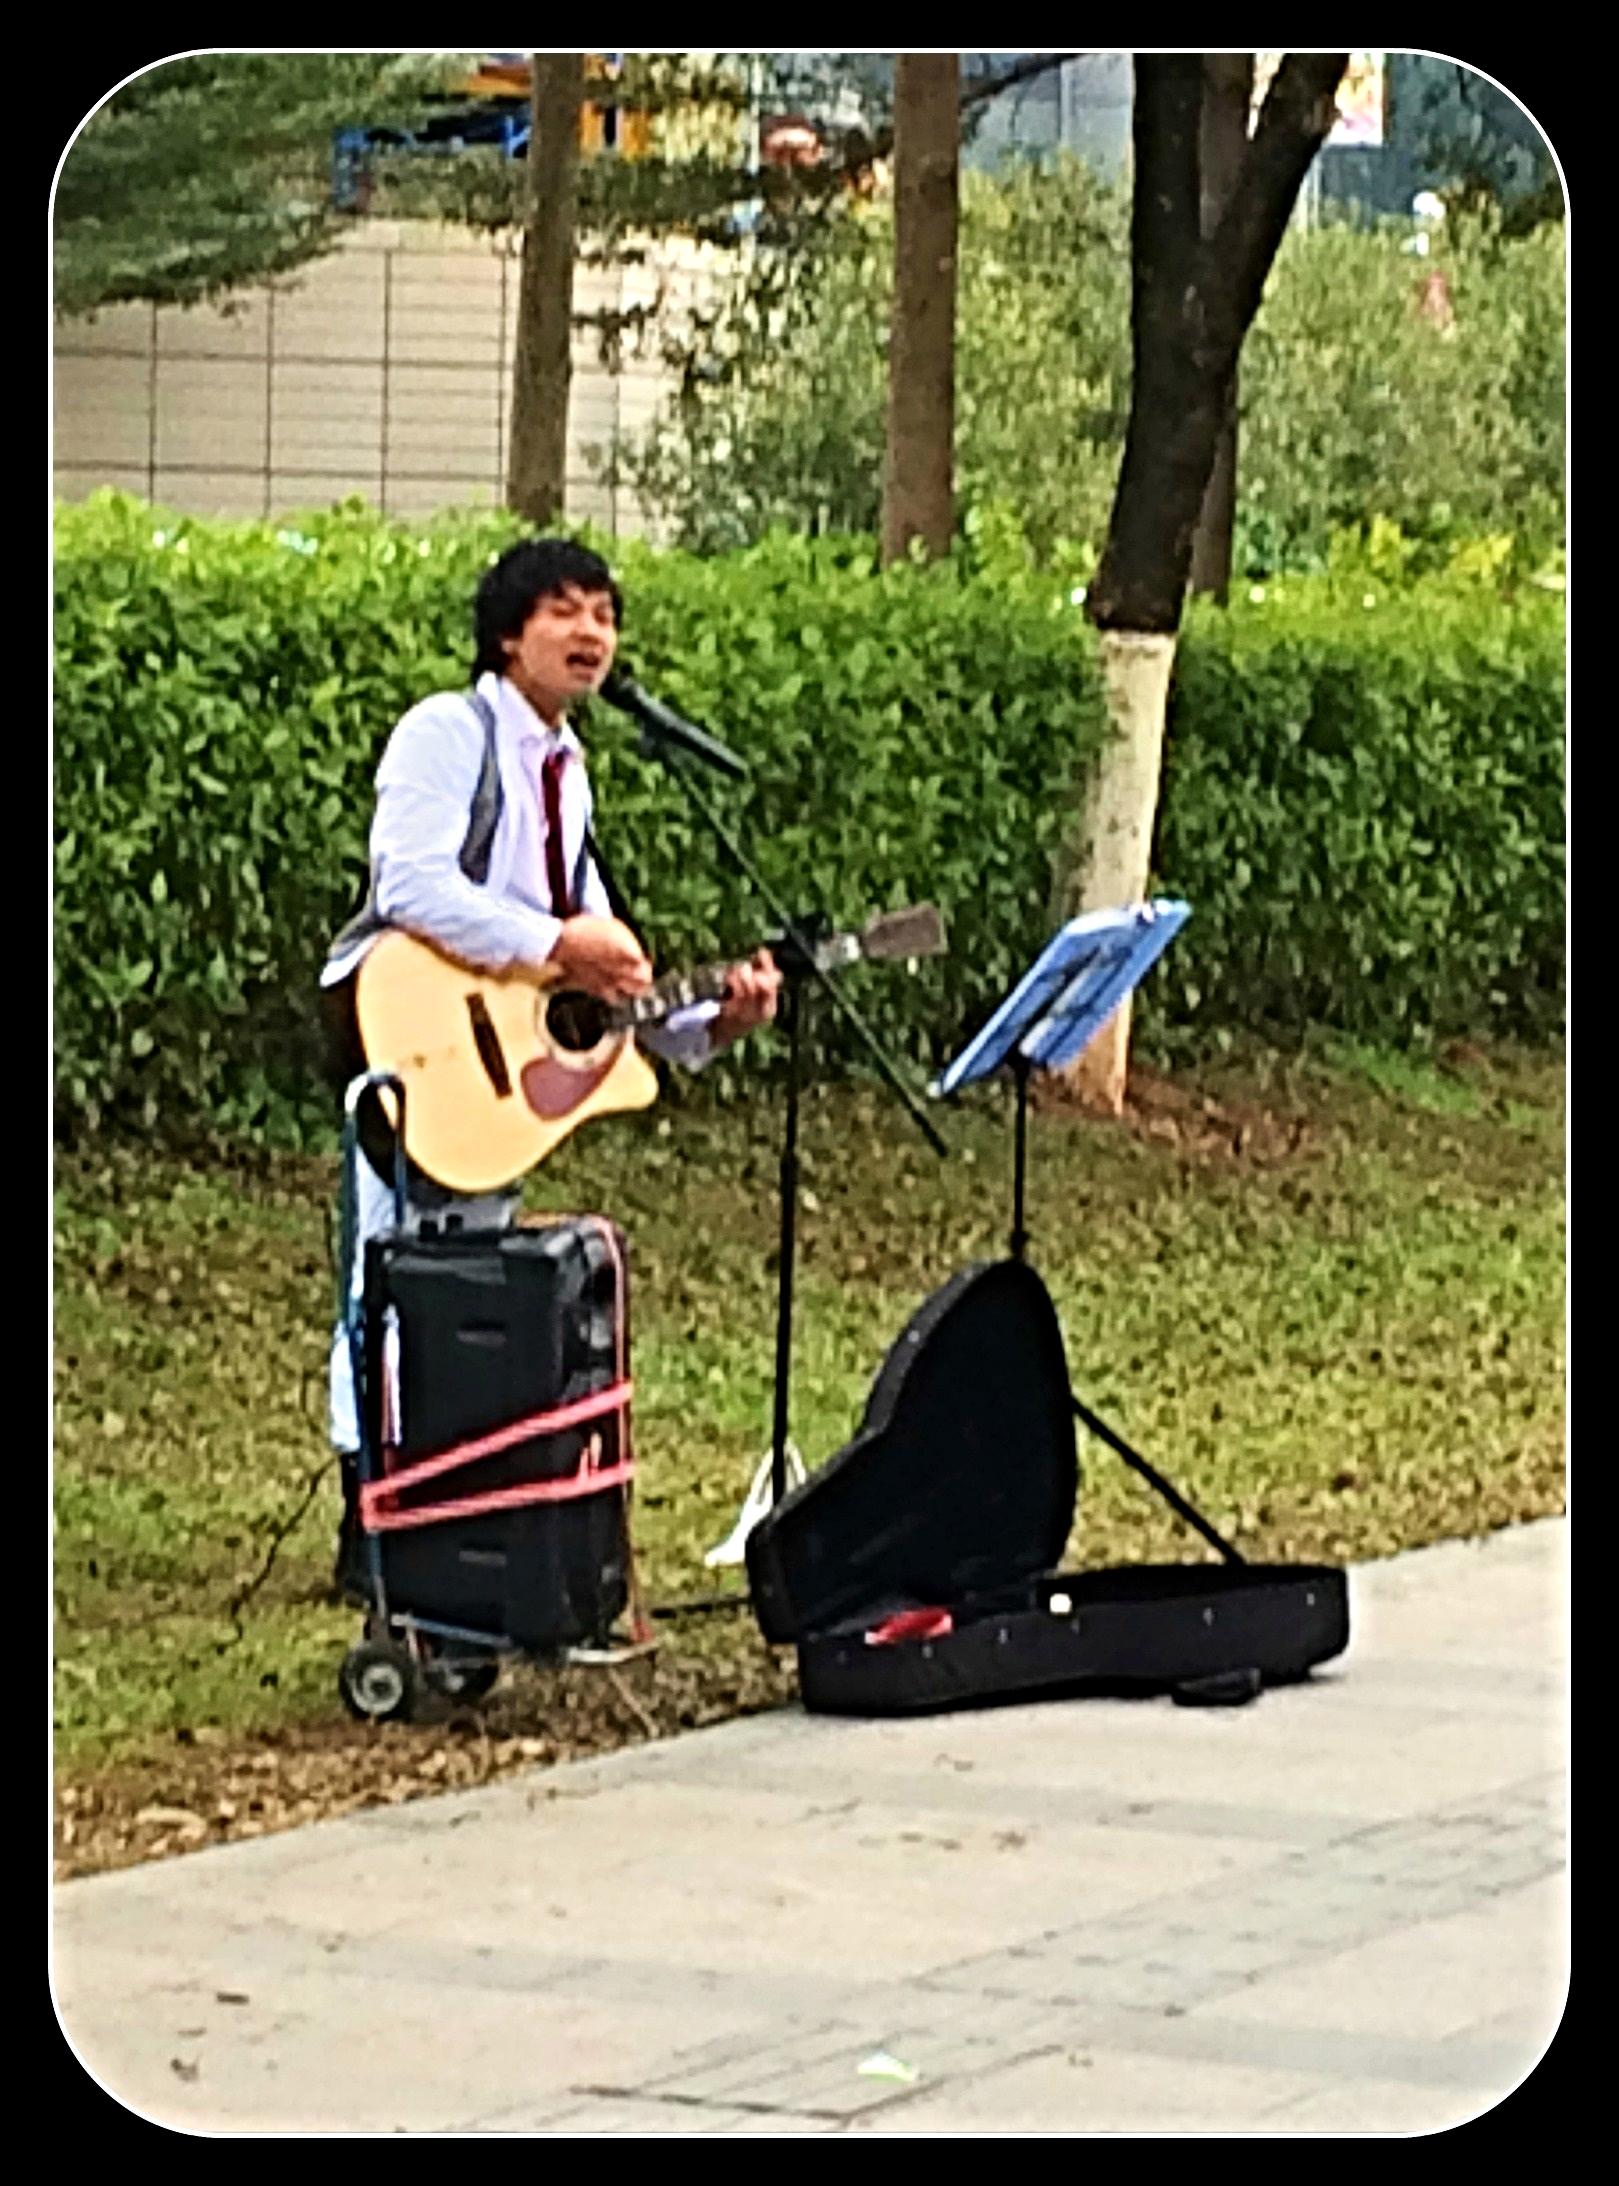 02-02 street musician2.jpg